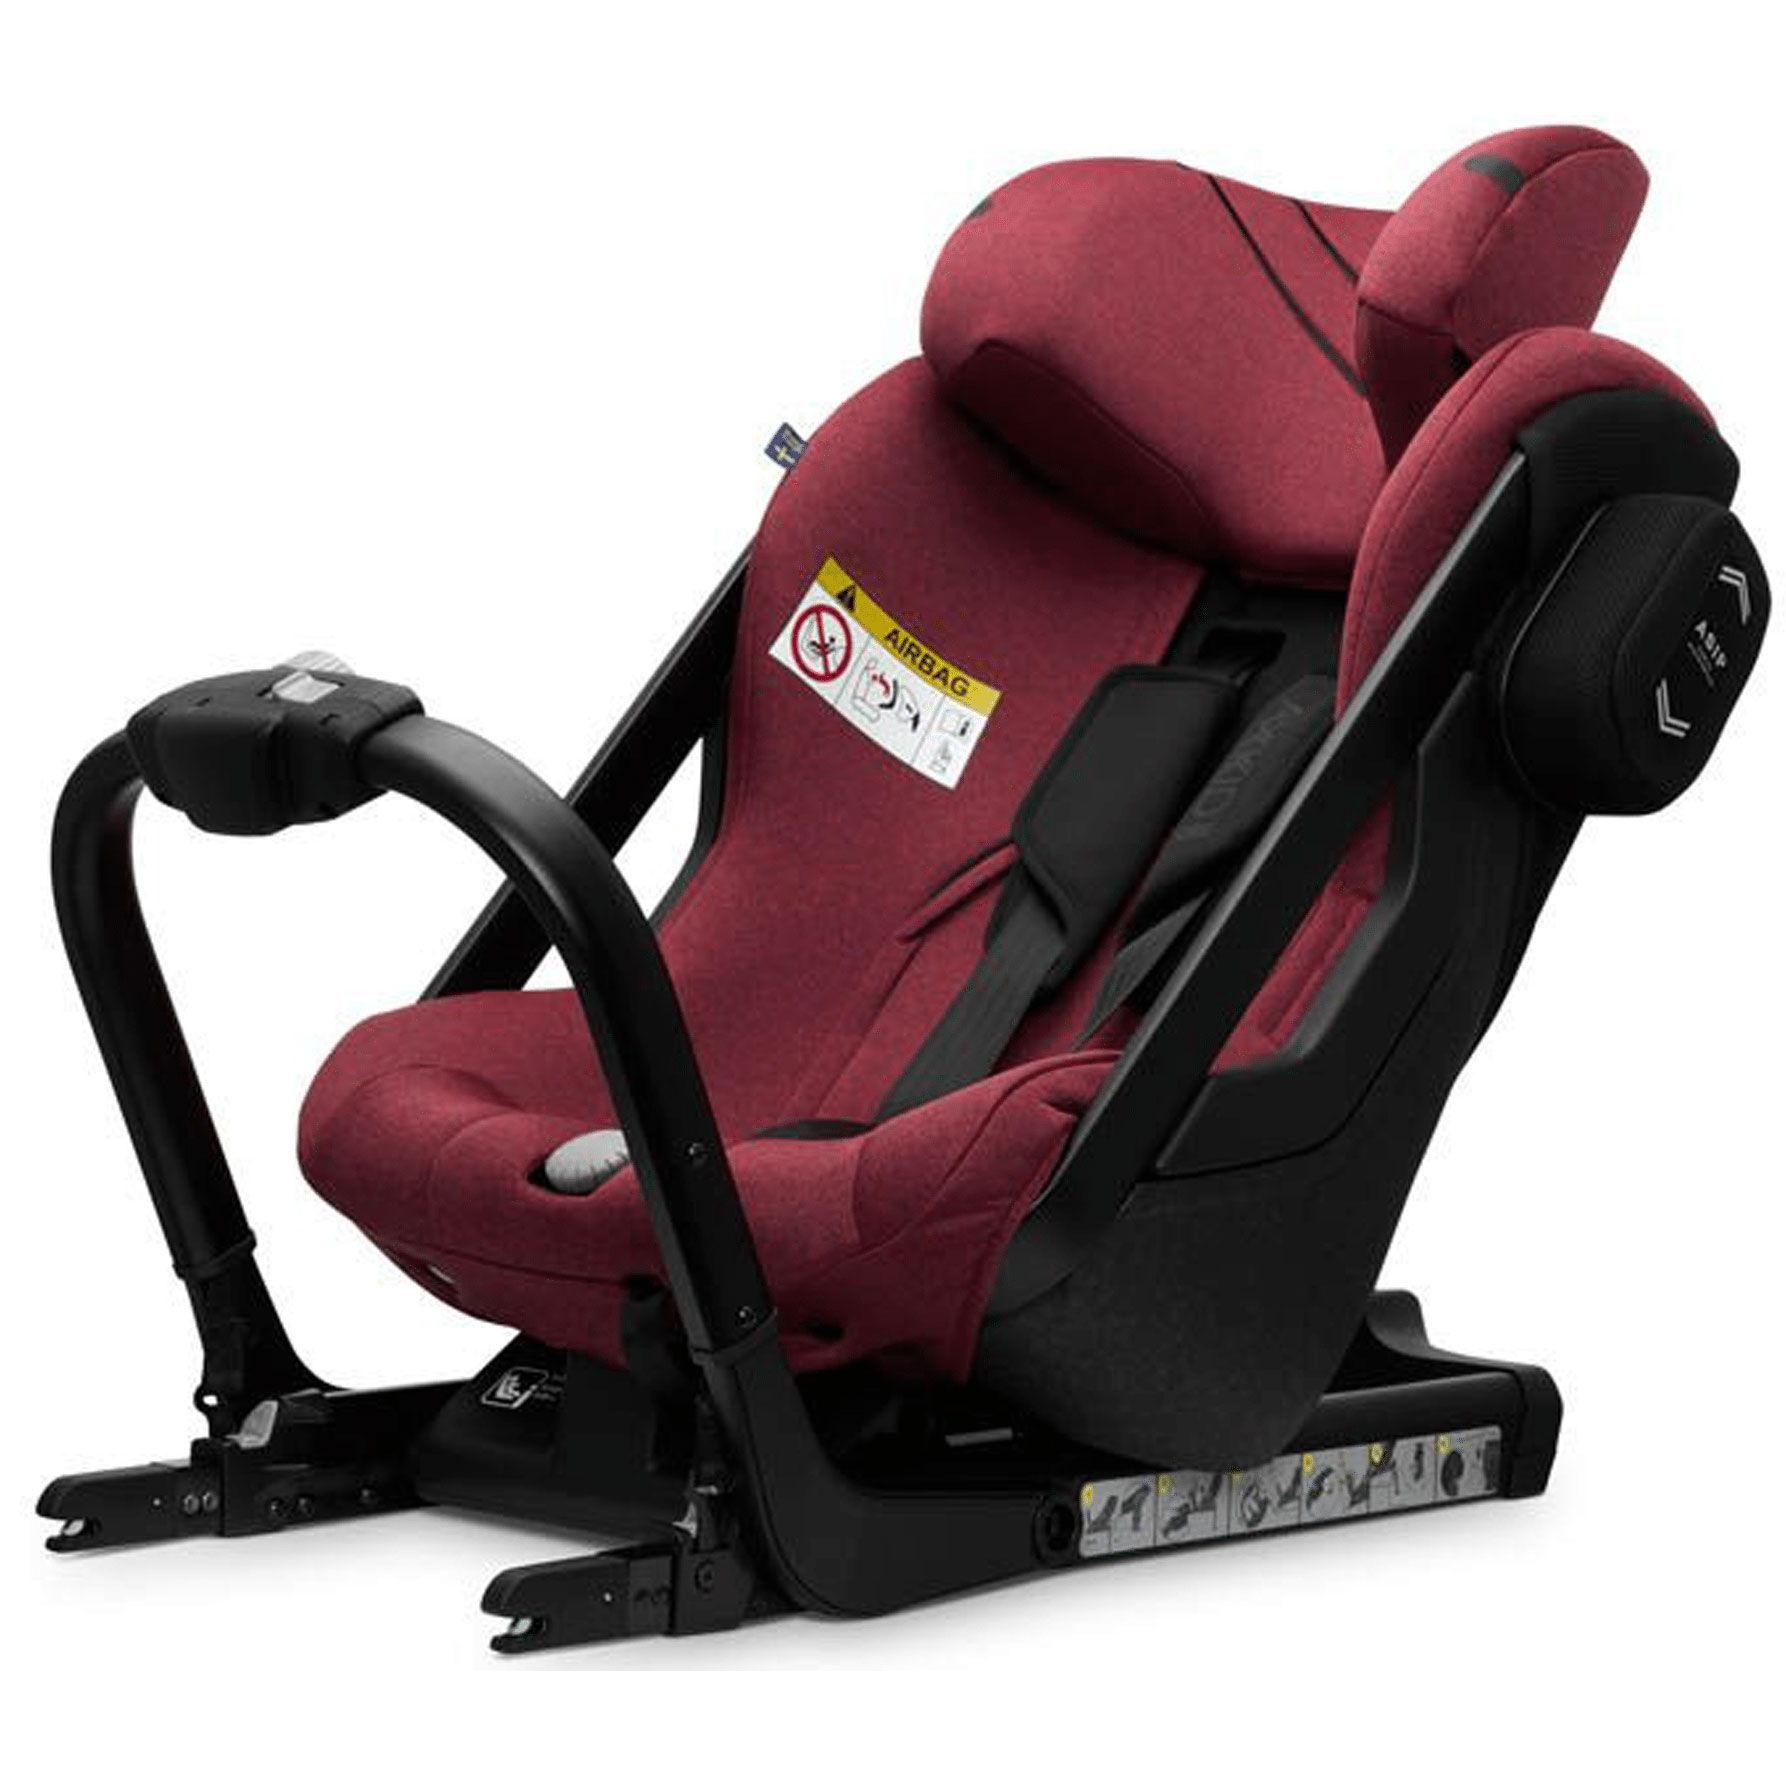 Axkid One Plus Test Car Seat